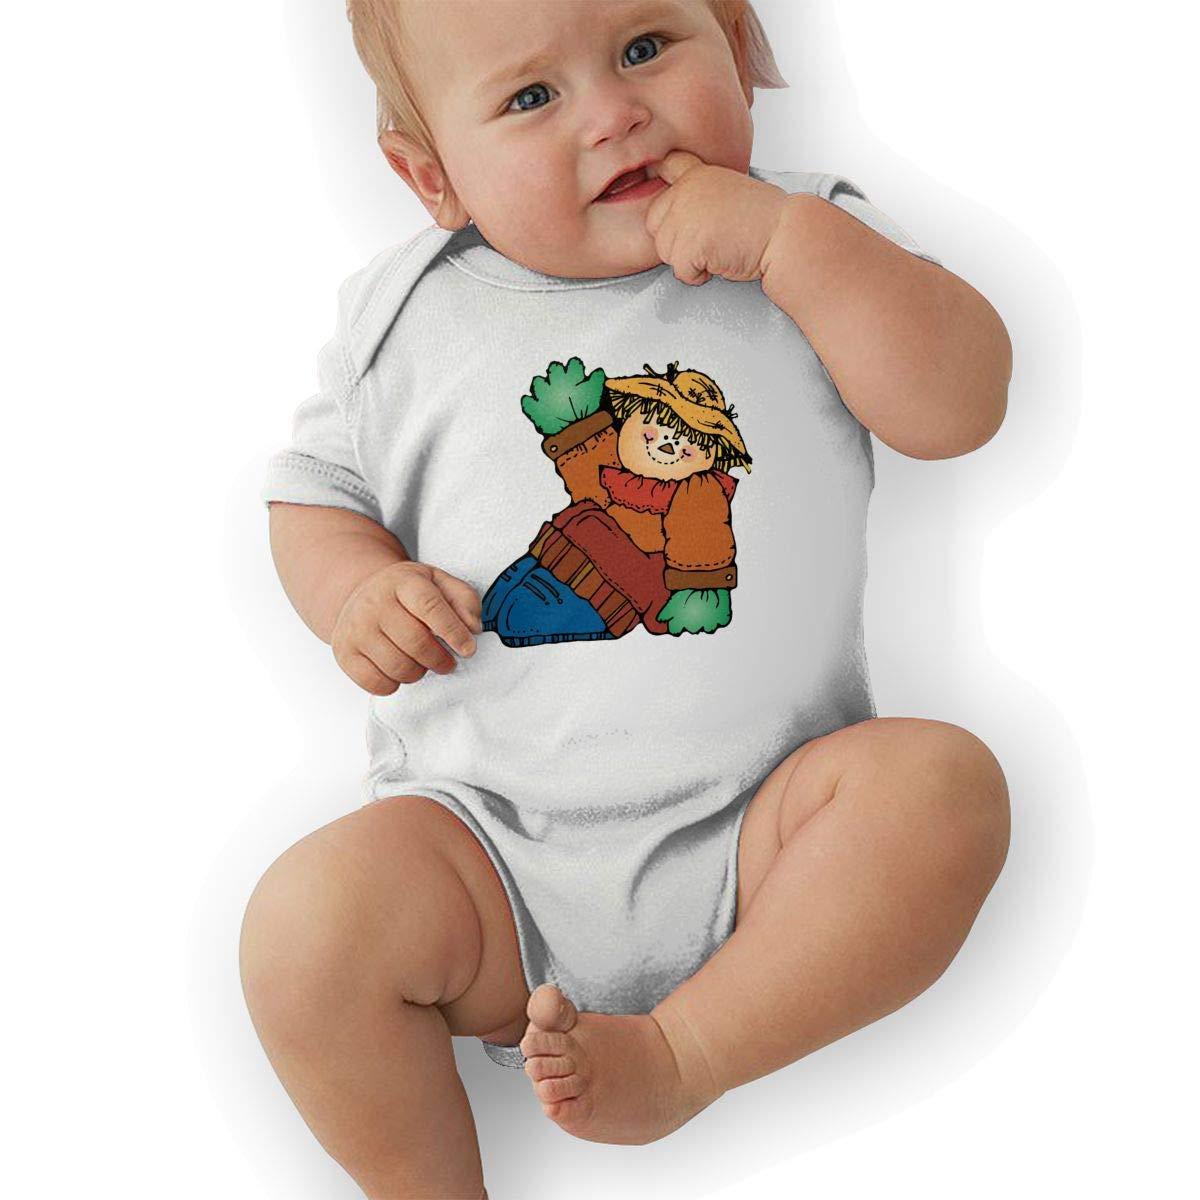 Infant Baby Boys Bodysuit Short-Sleeve Onesie Scarecrow Fat Boy Print Rompers Spring Pajamas